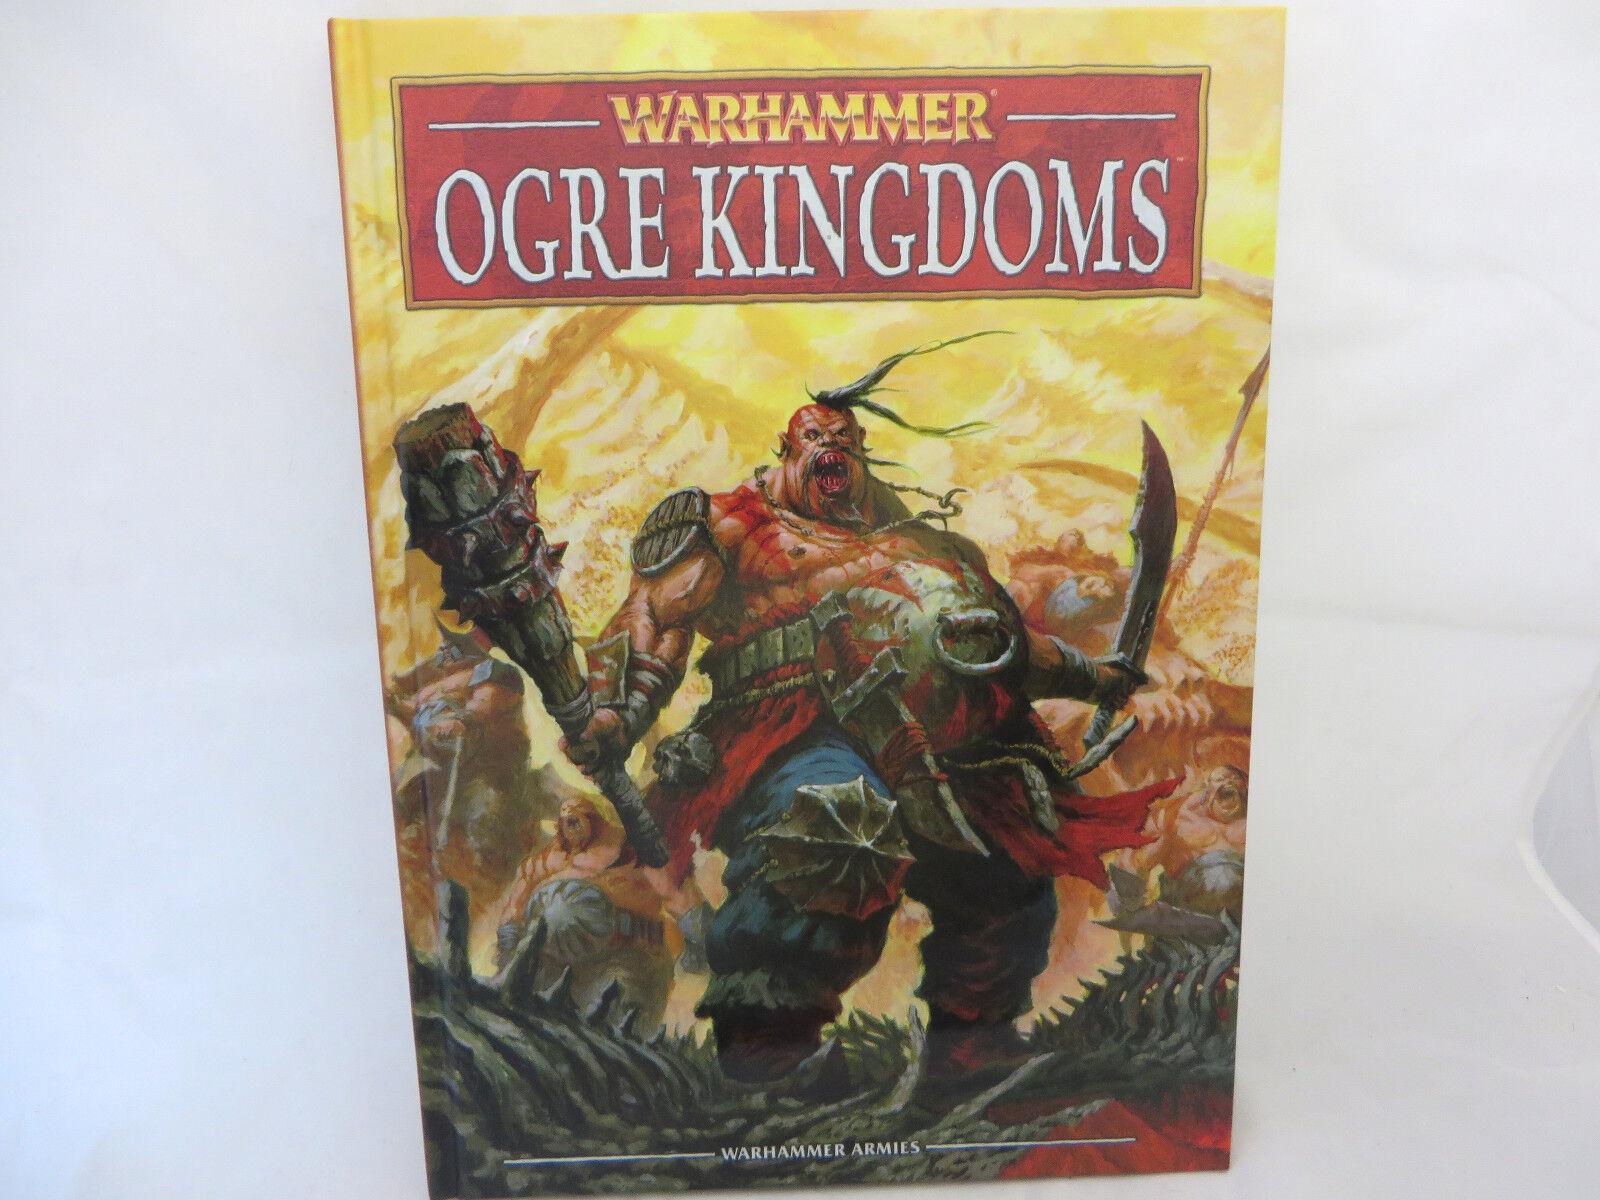 Warhammer Ogre Ogre Ogre Kingdoms army book codex oop hardcover 9dc89b